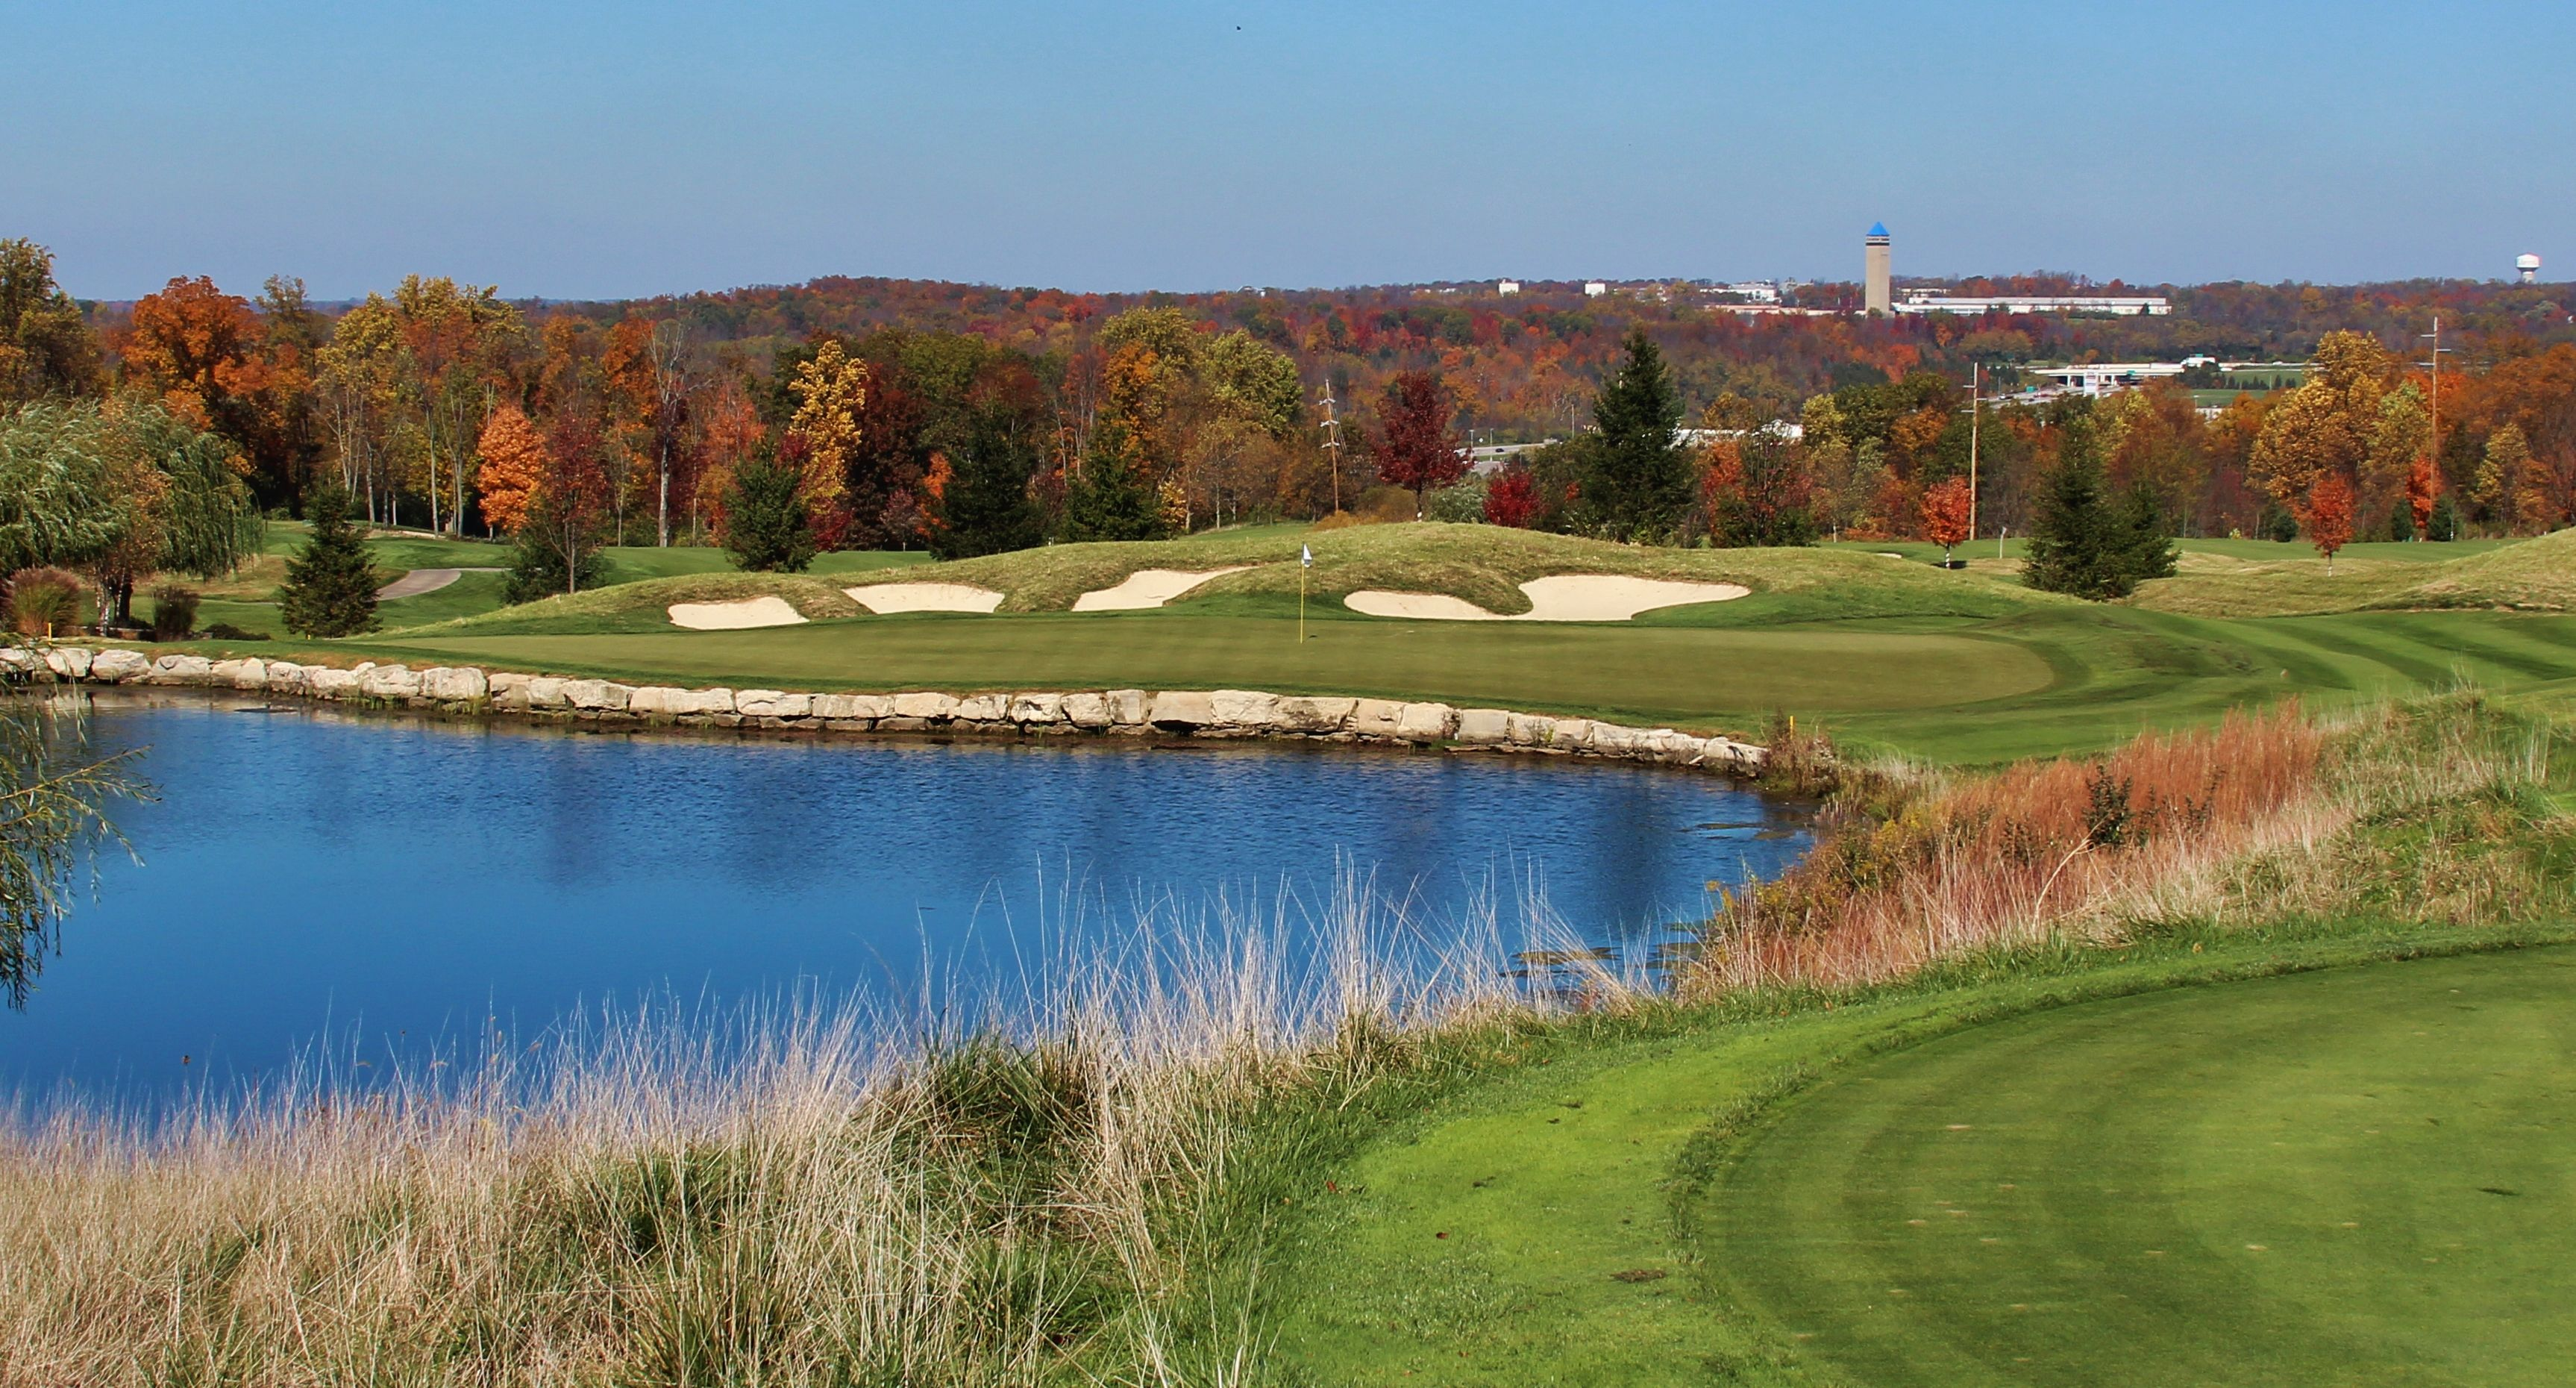 River S Bend Golf New Housing Developments Farm Ohio